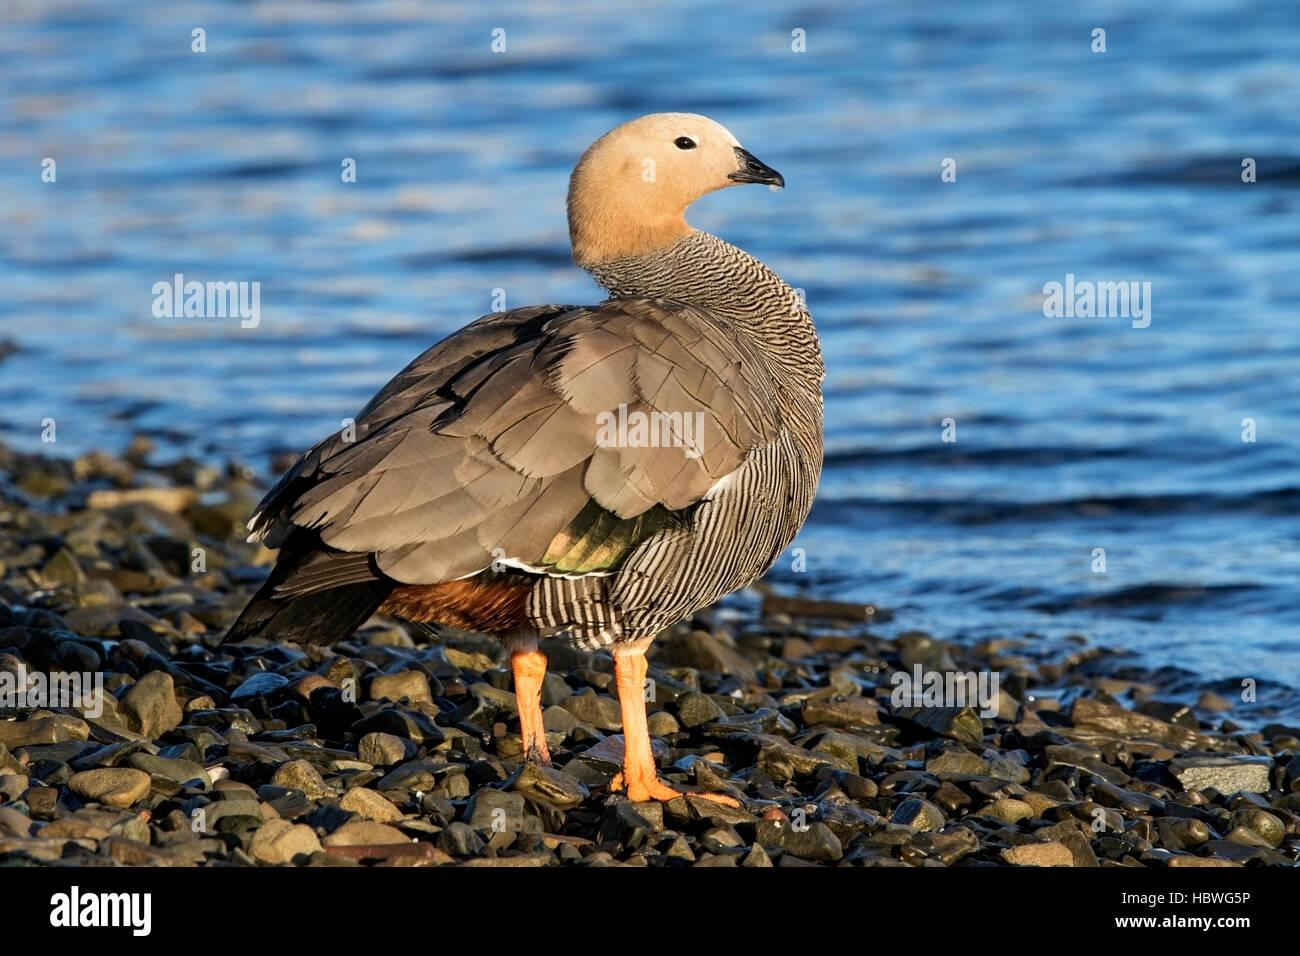 ruddy-headed goose (Chloephaga rubidiceps) adult bird standing near  water on shoreline, Falkland Islands - Stock Image